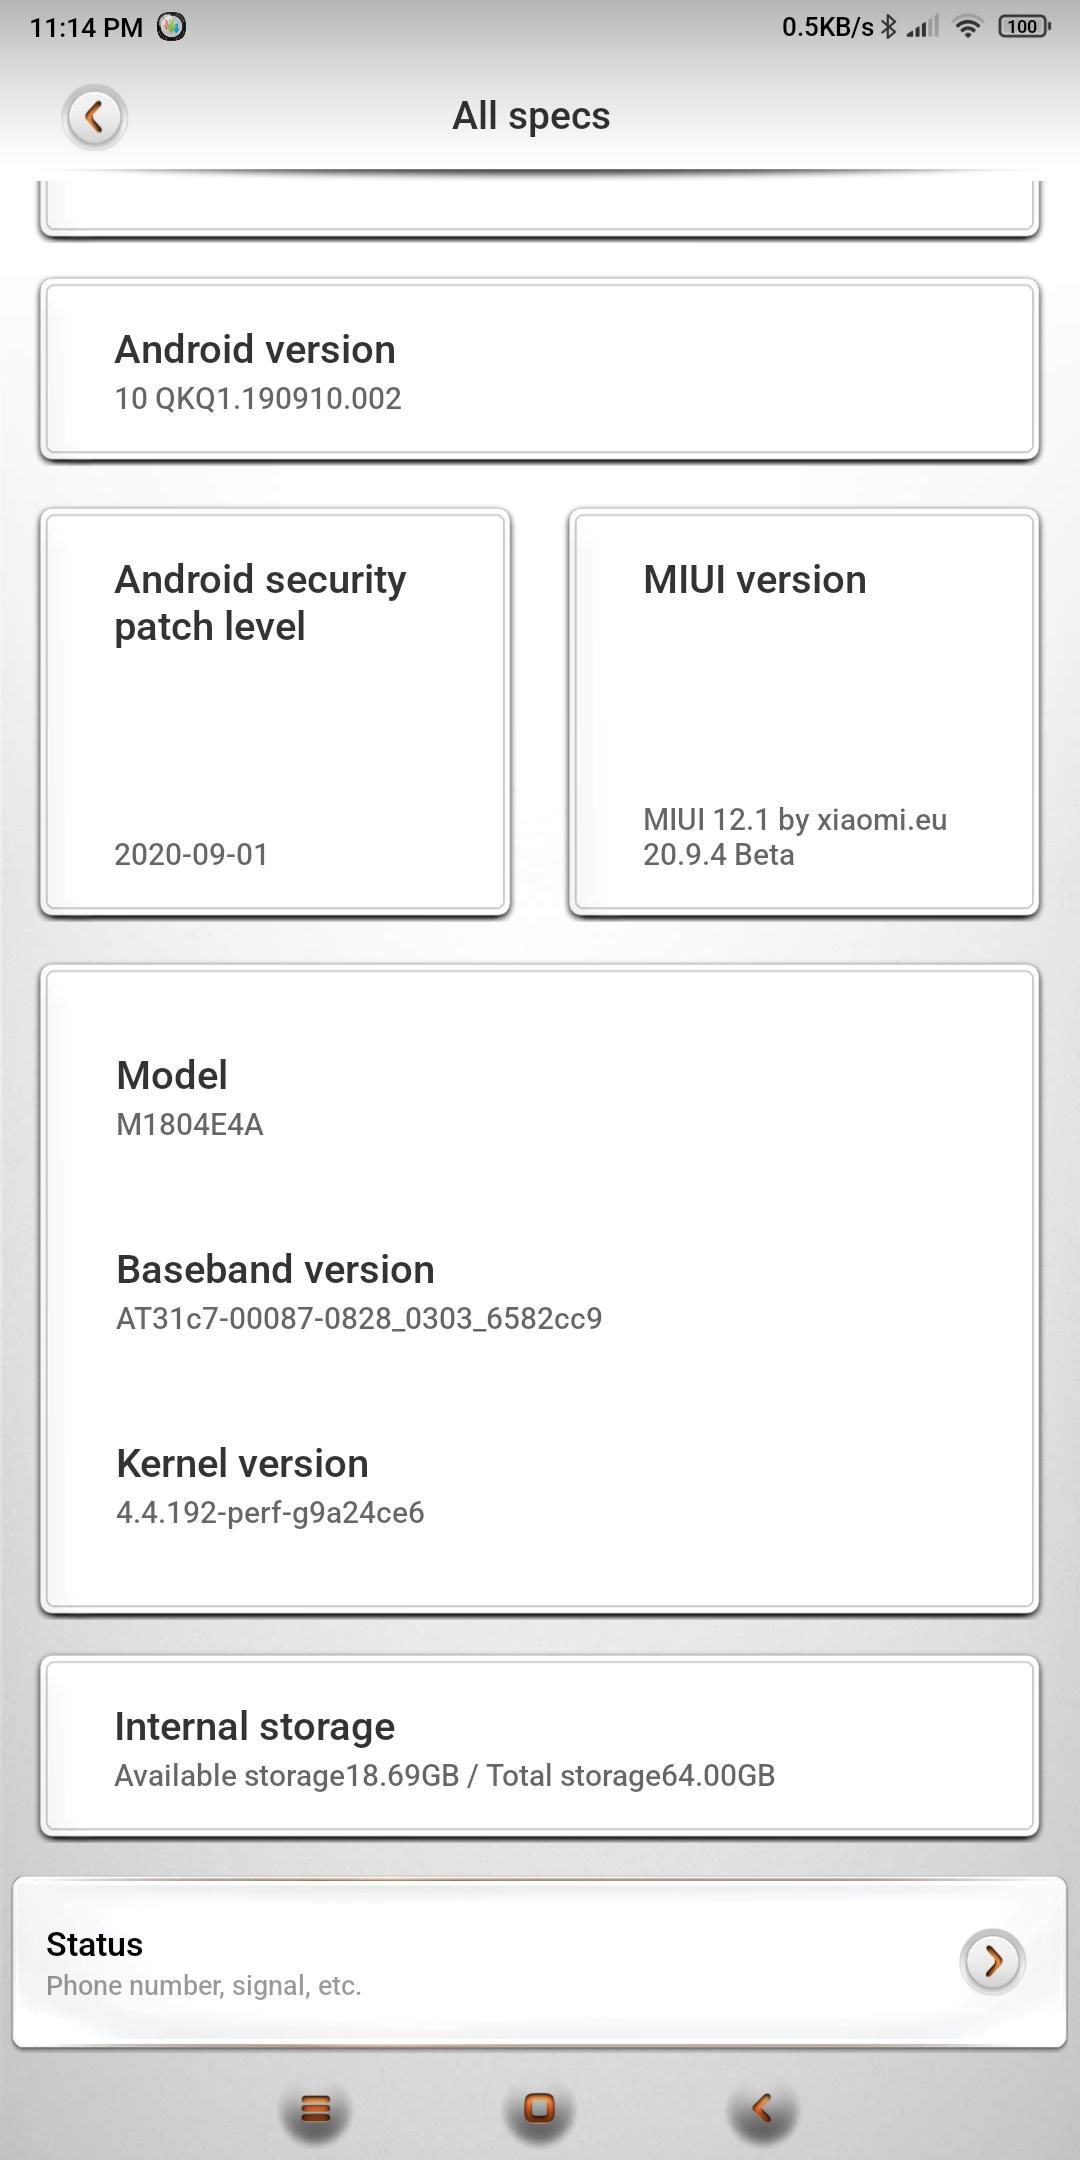 Screenshot_2021-01-23-23-14-31-737_com.android.settings.jpg